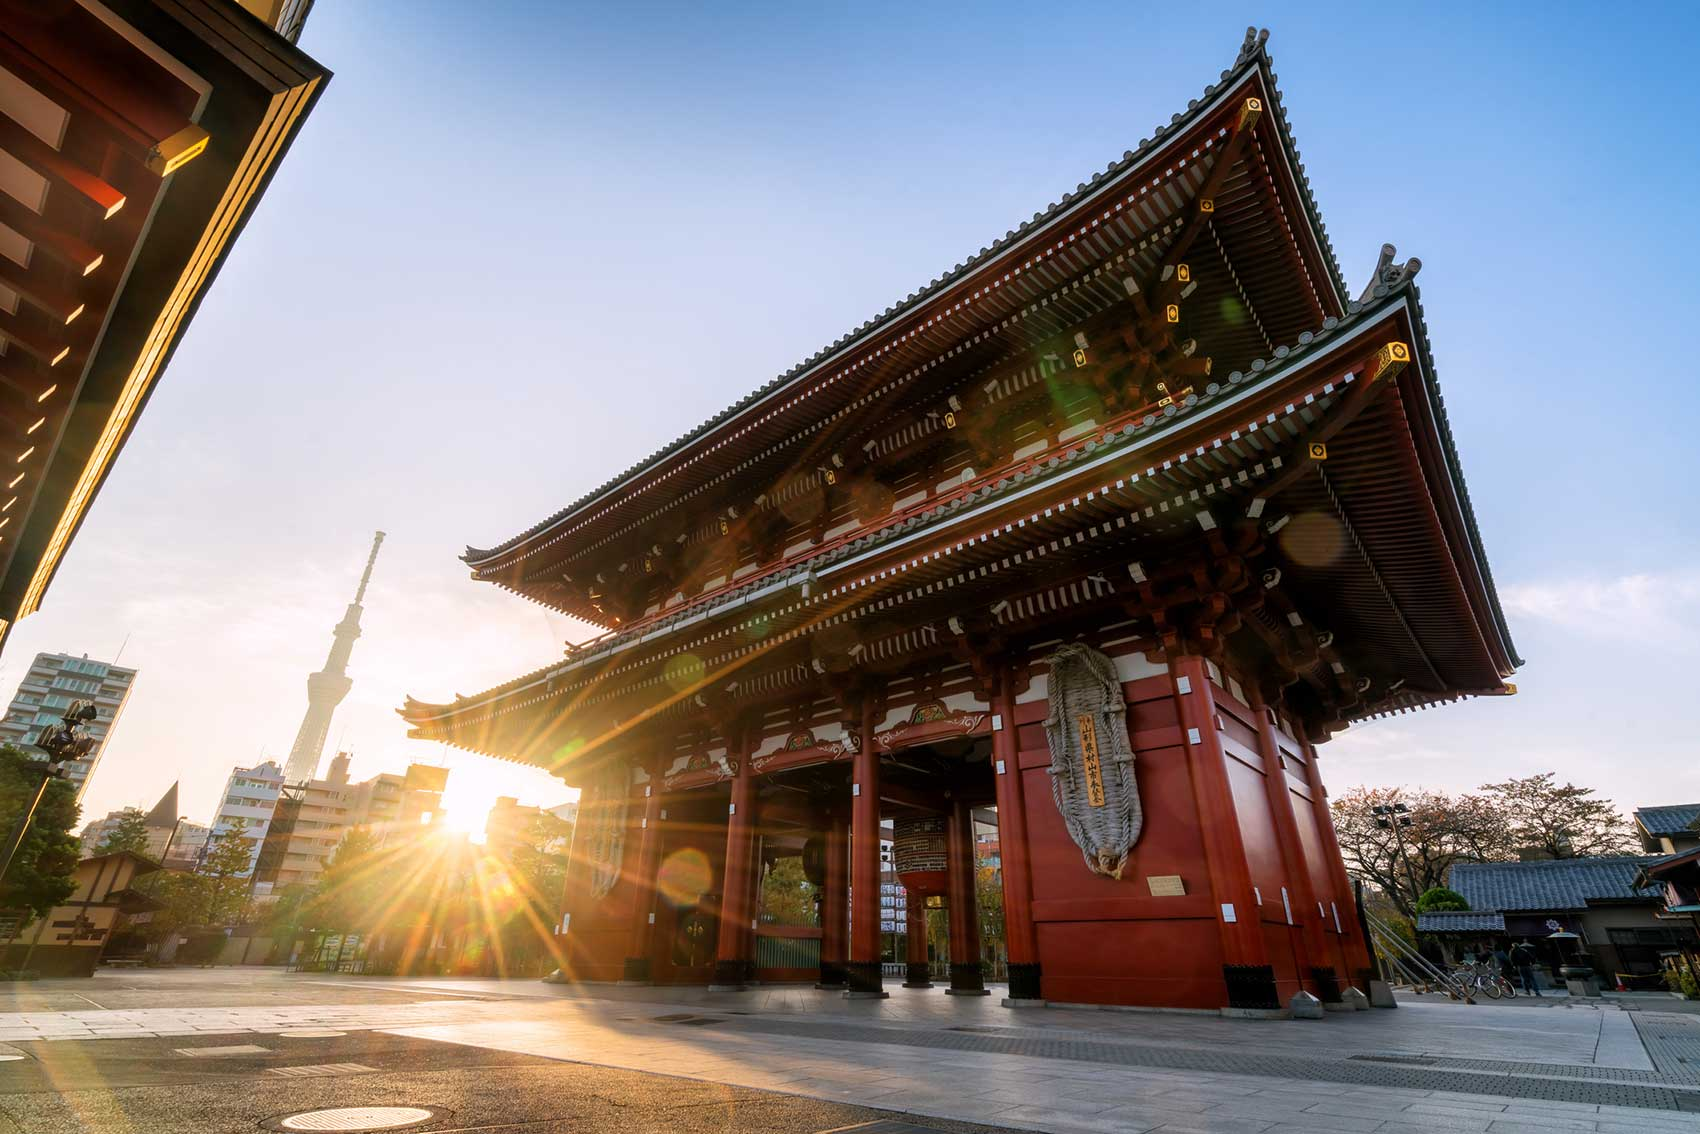 معبد سنسوجی